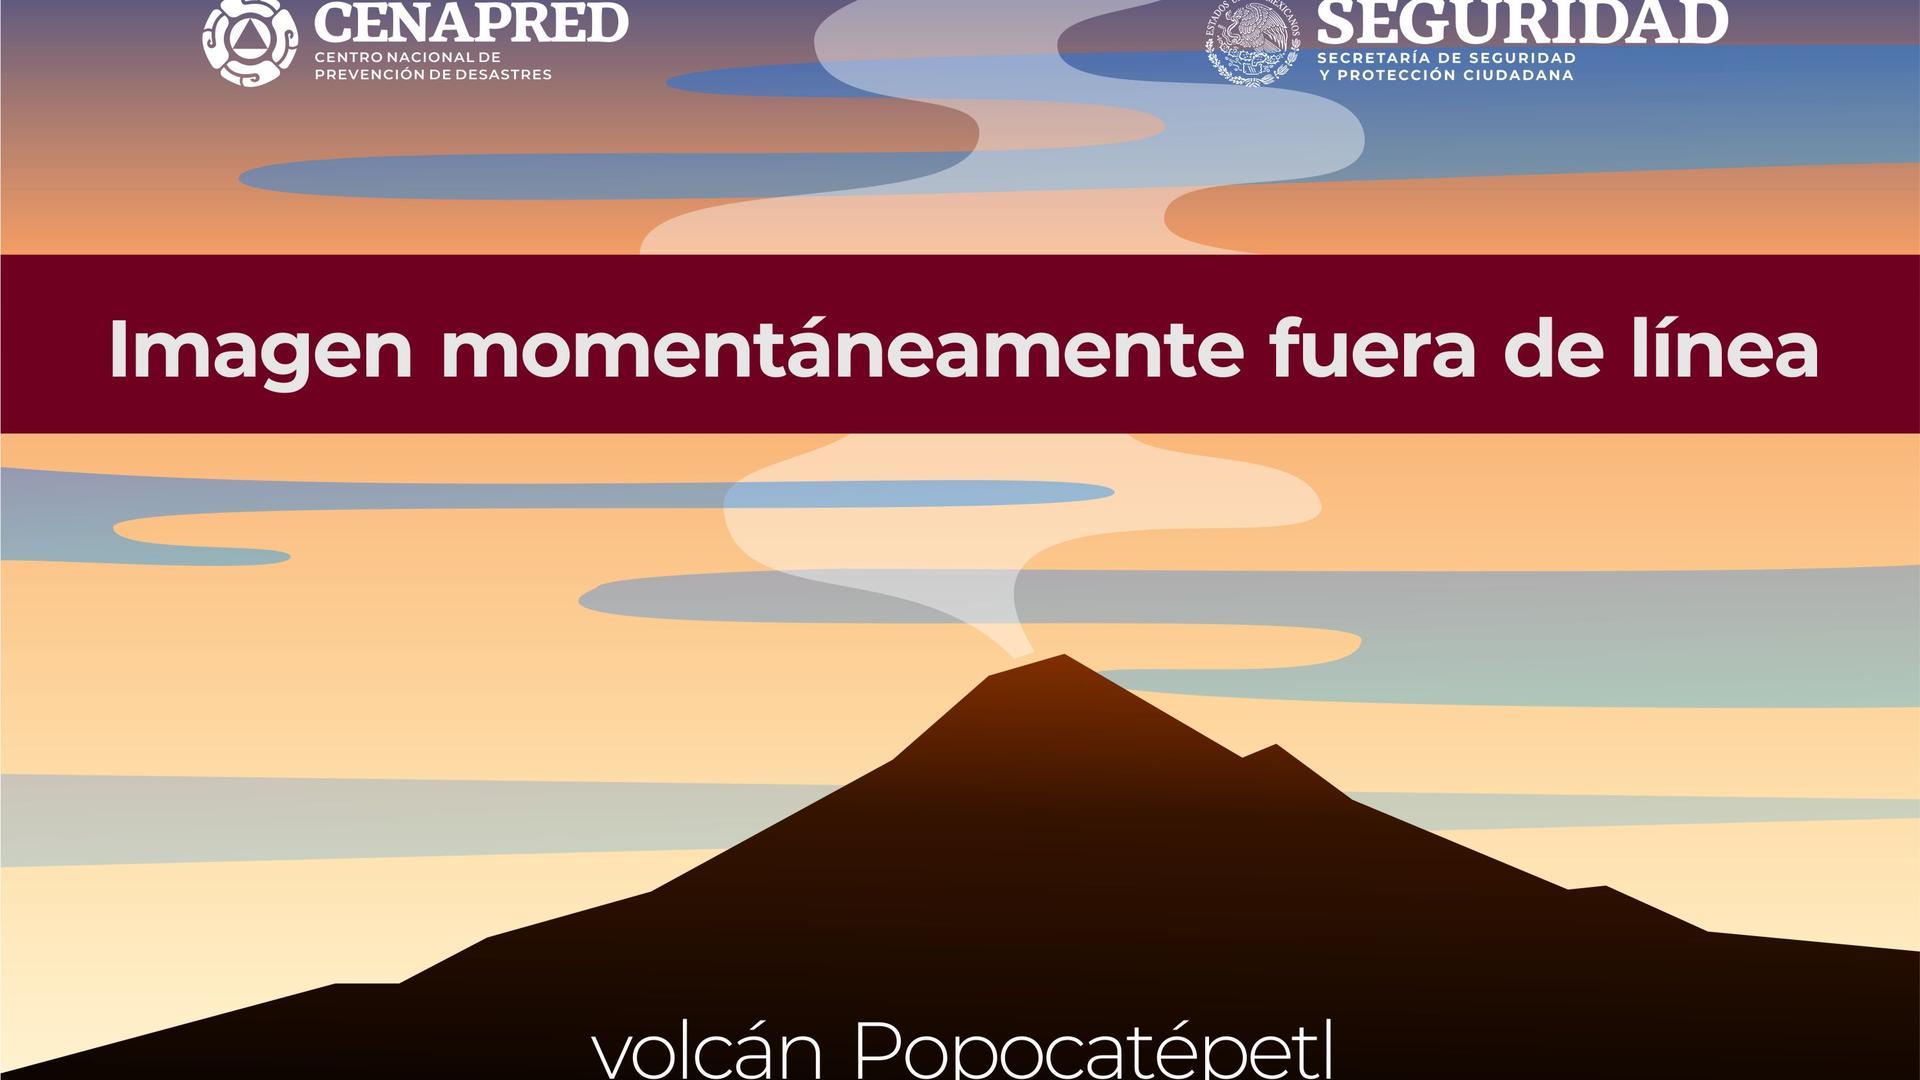 Webcam Tlamacas: Volcán Popocatépetl Flanco Norte (cerca)